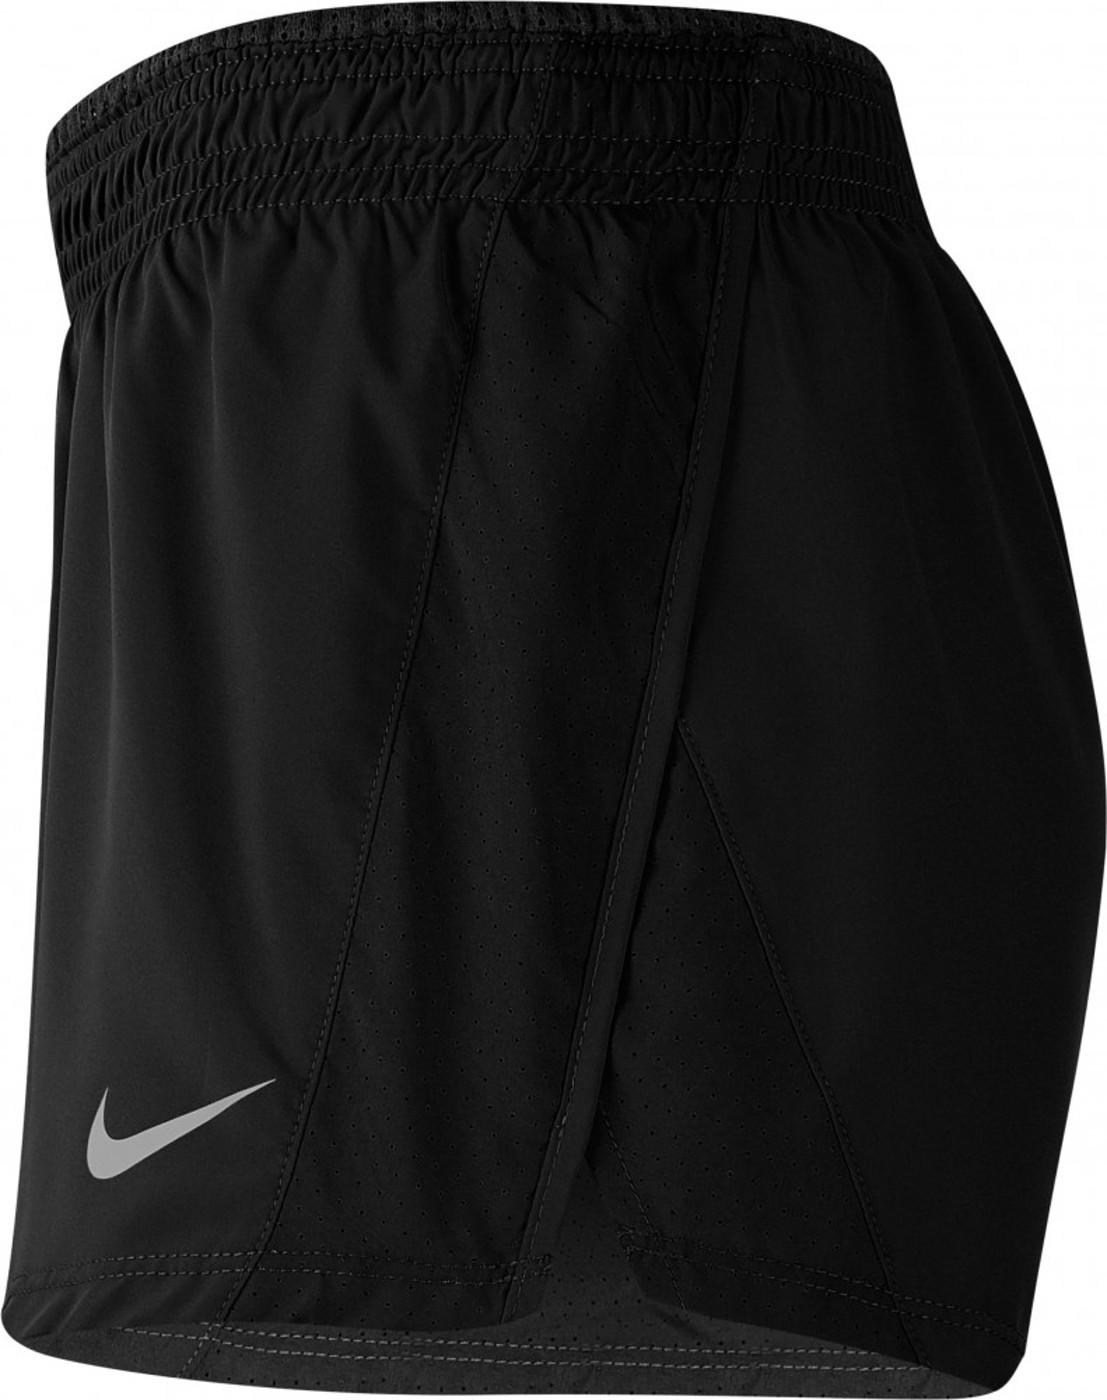 Nike 2-In-1 Running Sh - Damen